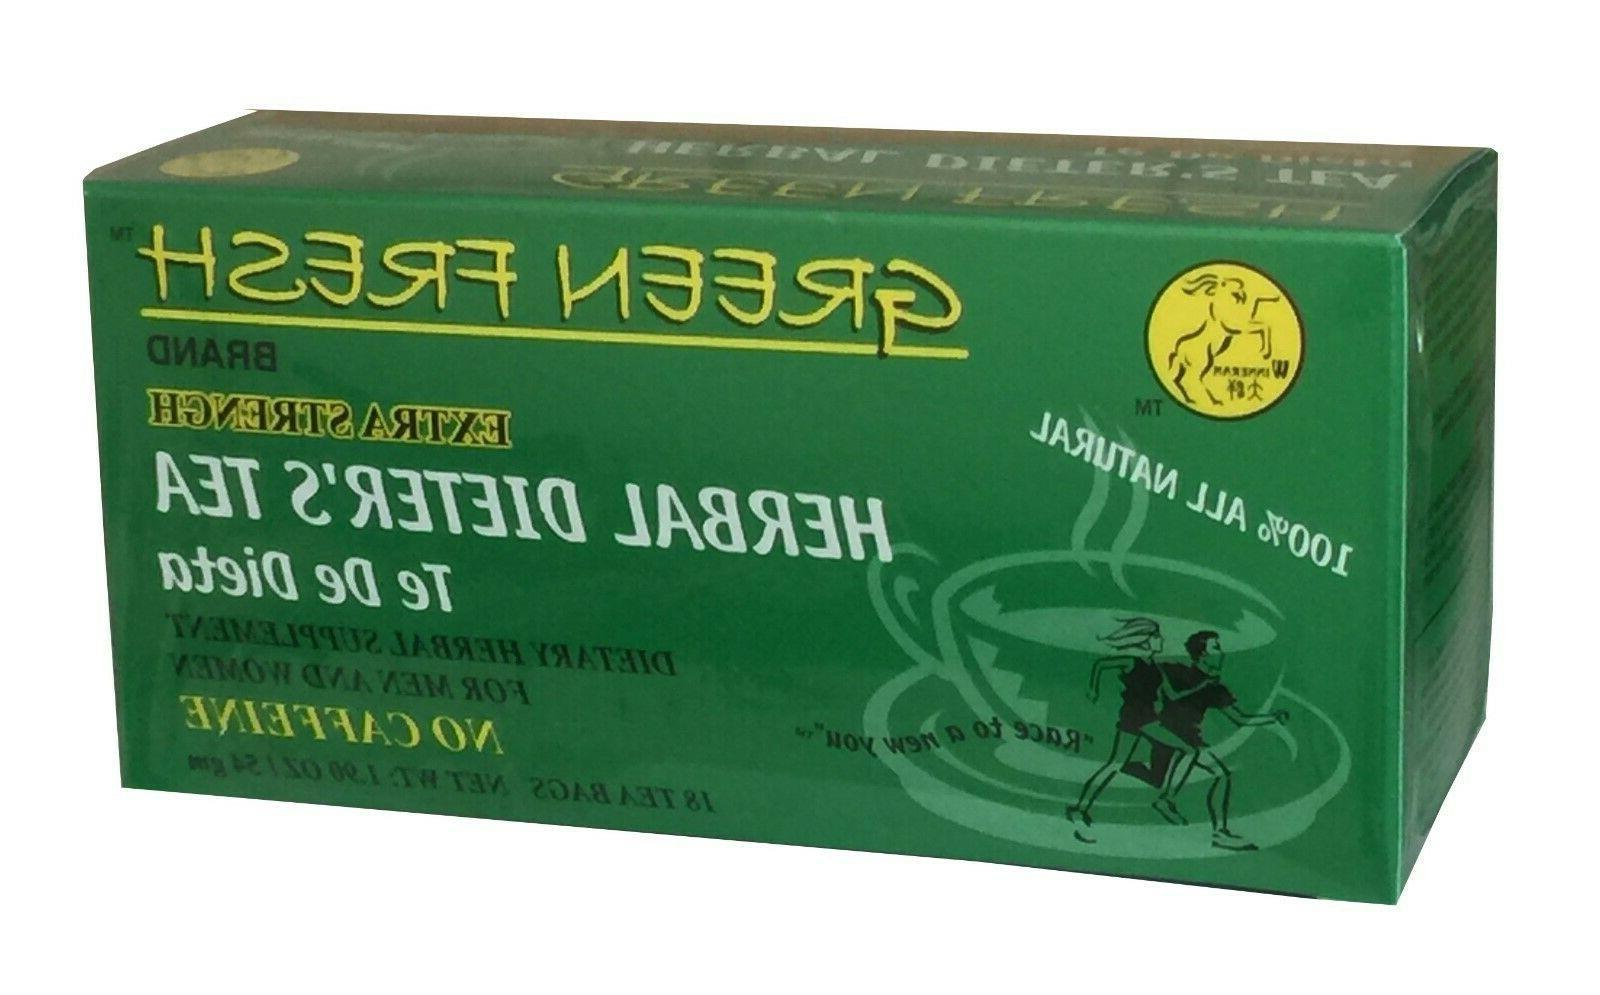 dieters tea extra strength 18 tea bags